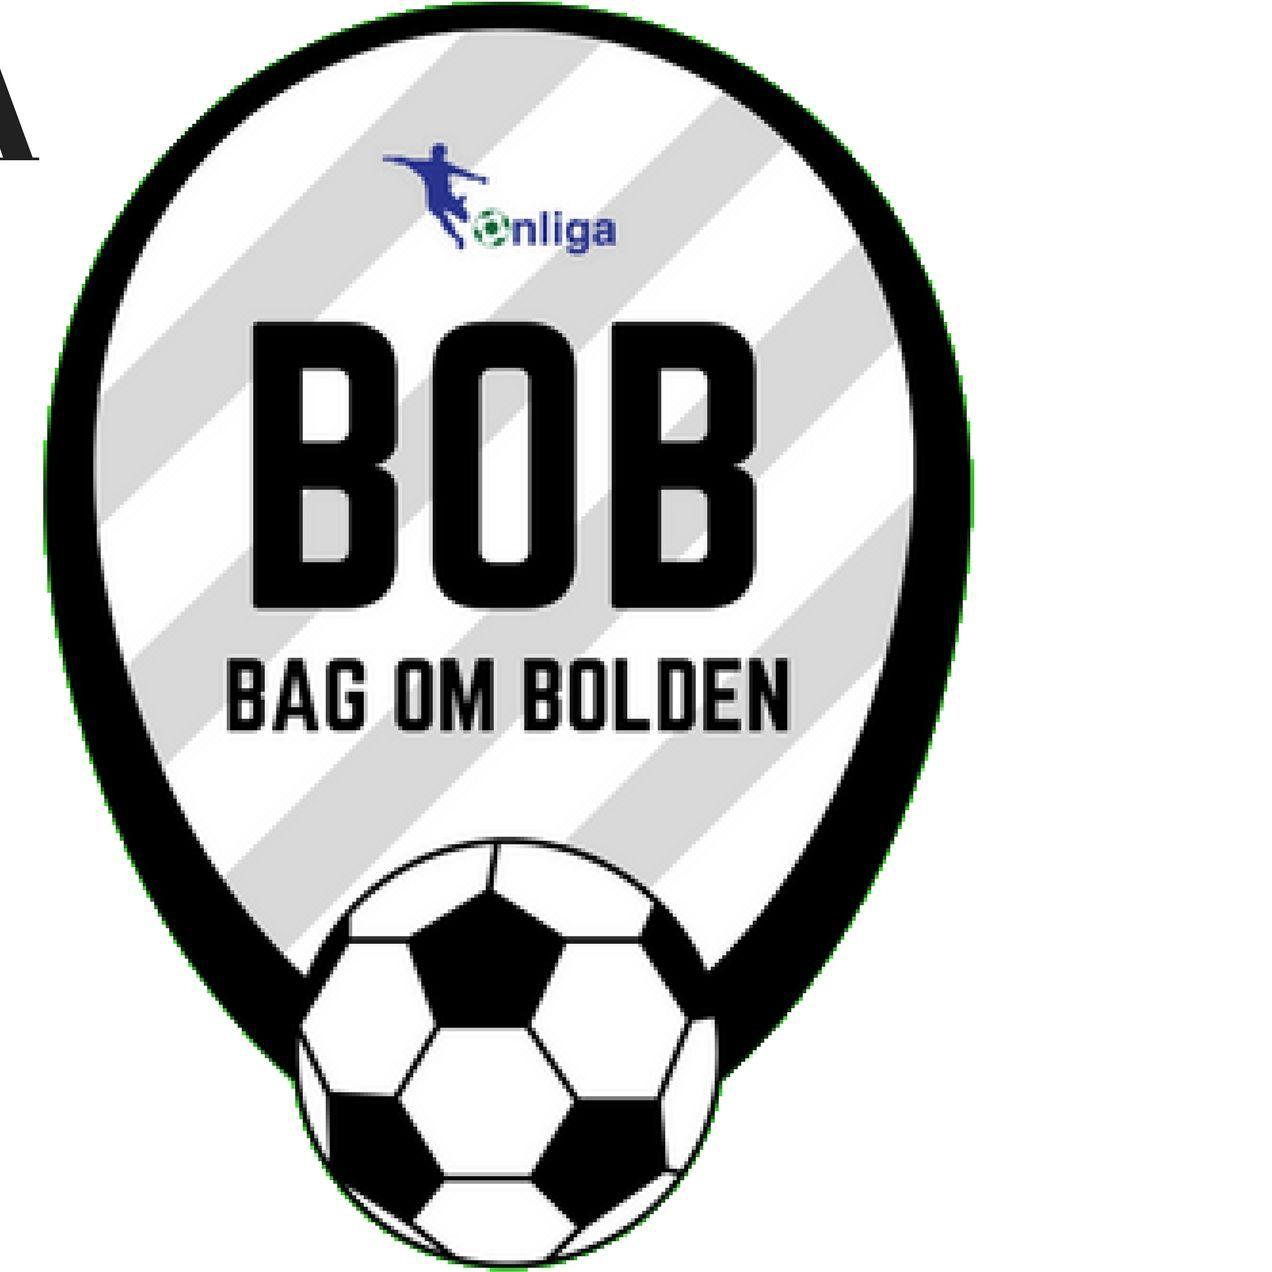 Bag om Bolden (Superliga) ep 1